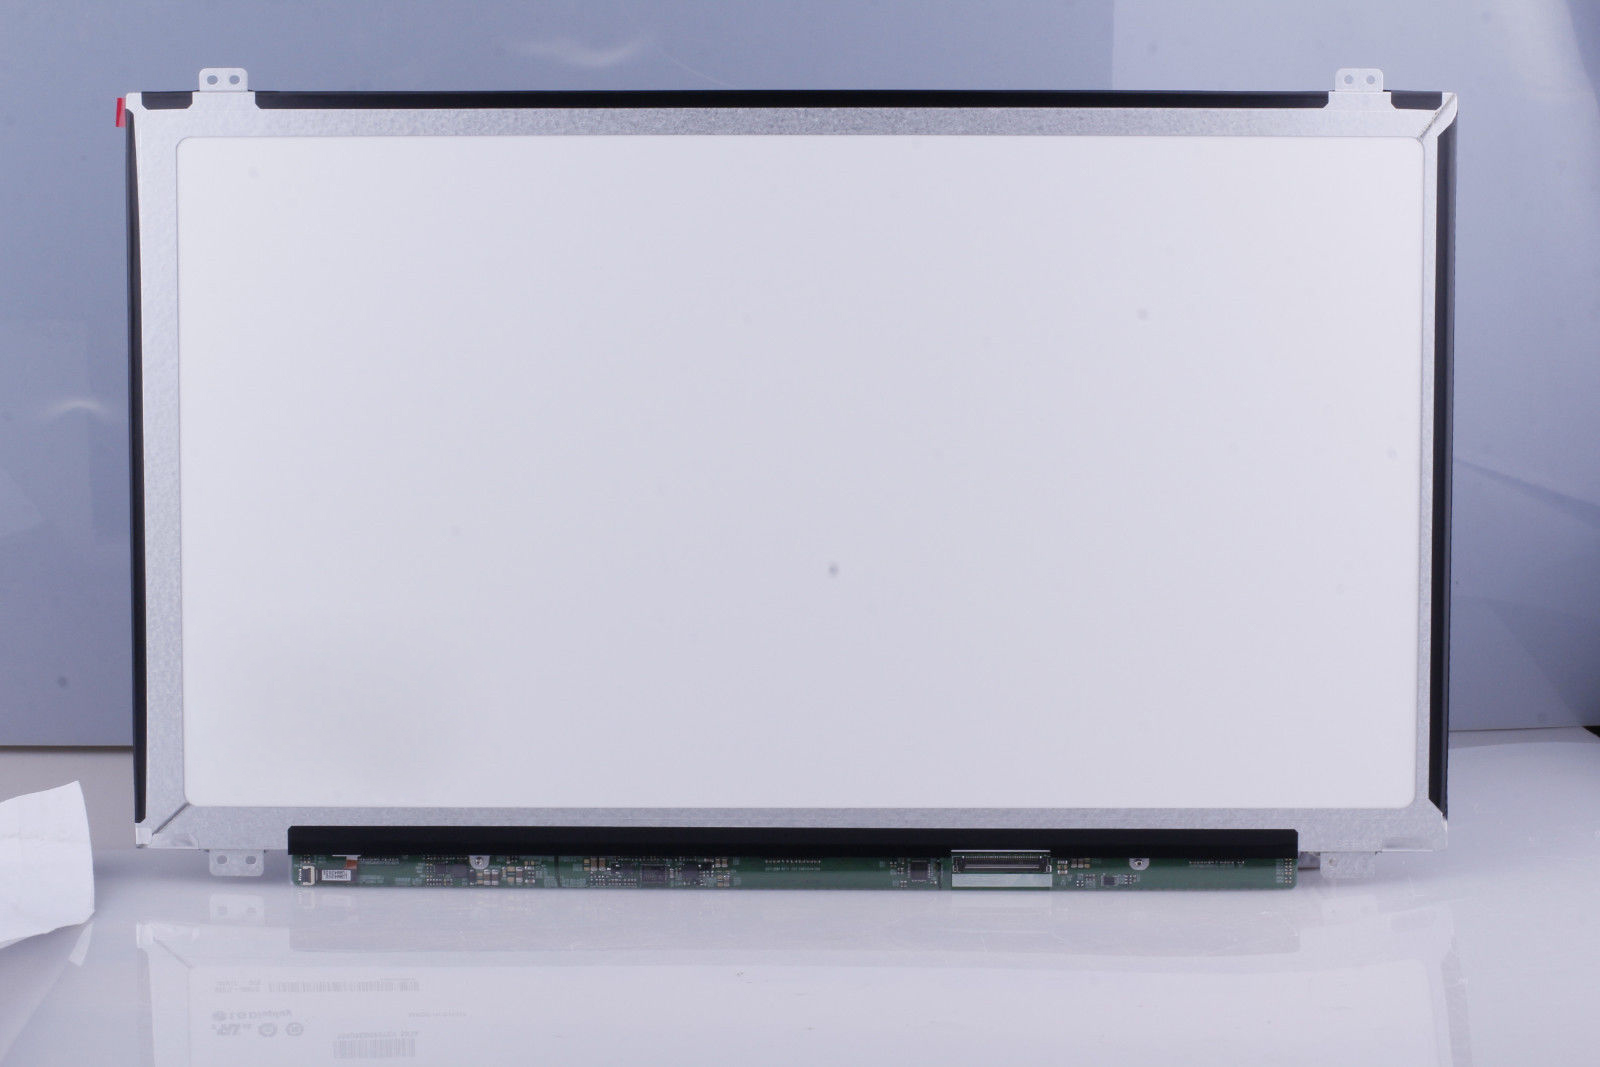 все цены на QuYing Laptop LCD Screen for HP Compaq ProBook 455 G2 J5P31UT (15.6 inch 1366x768 30Pin) онлайн